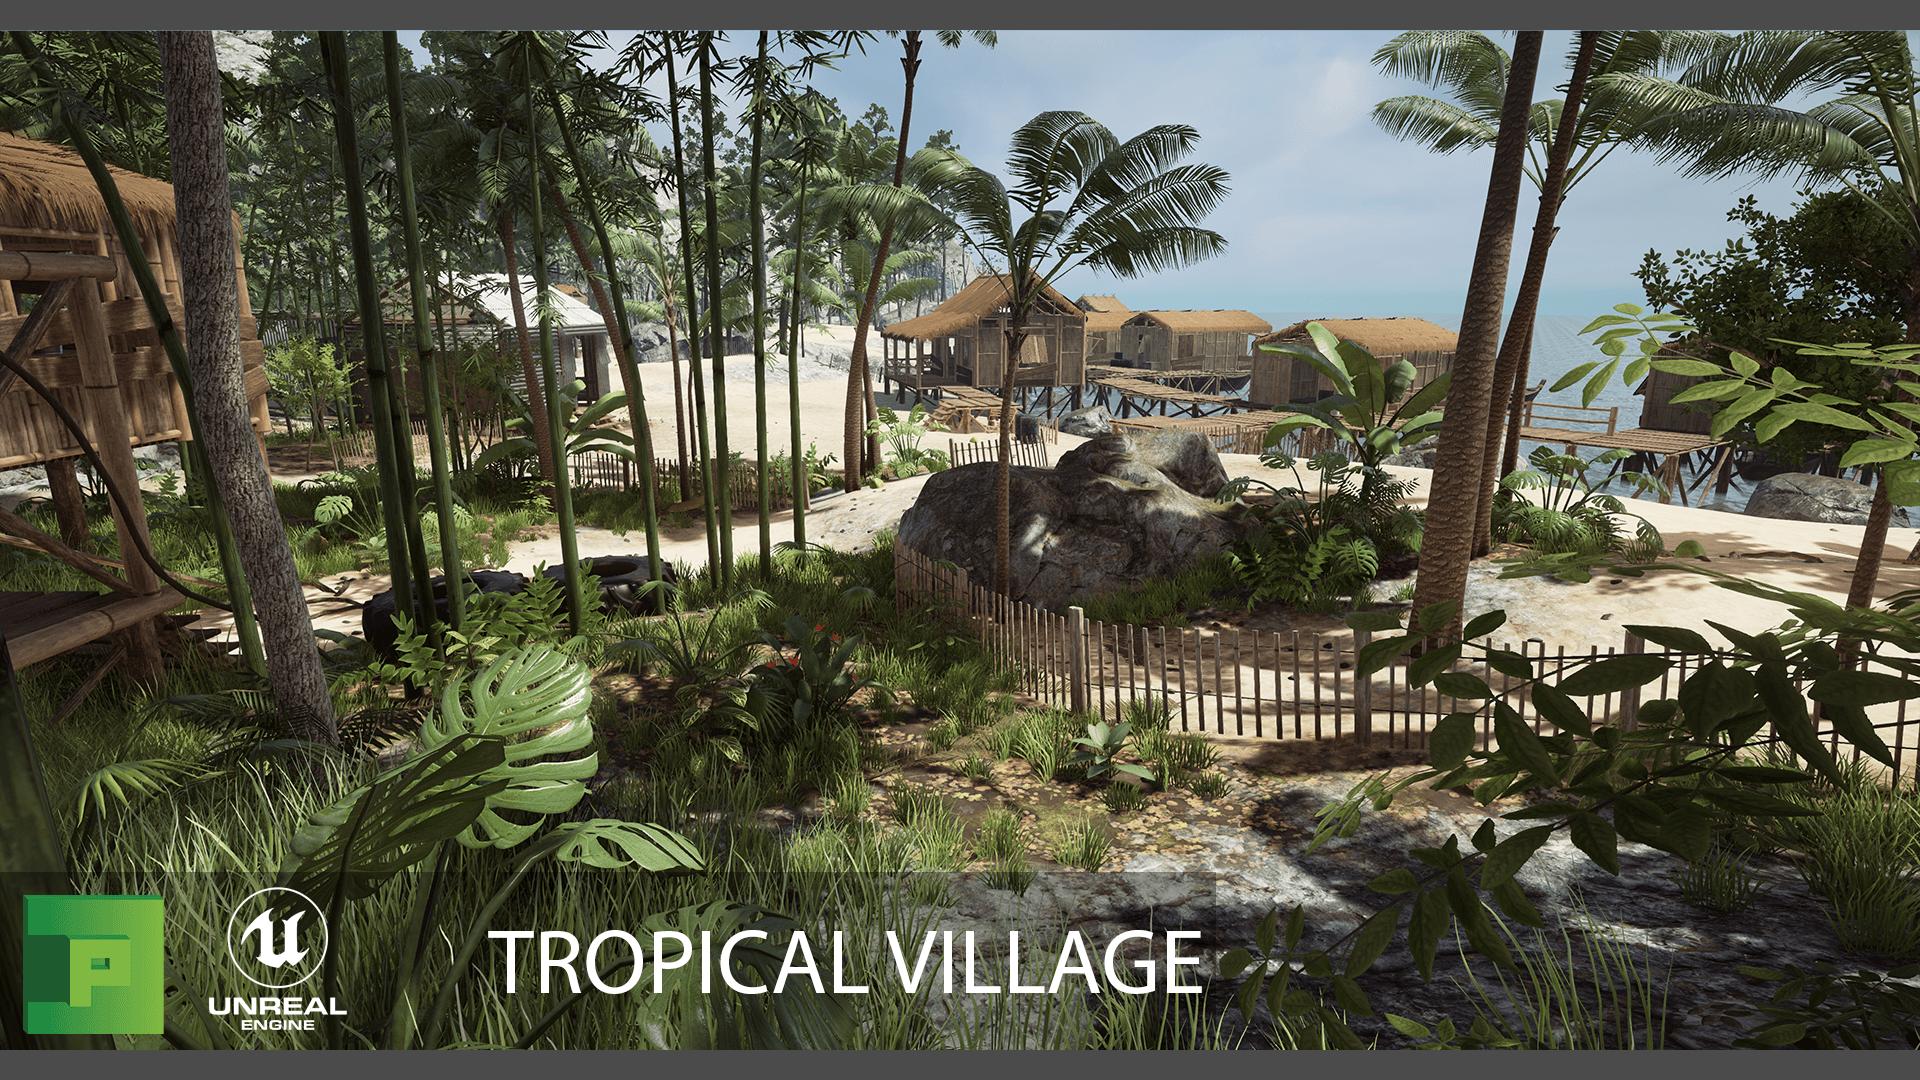 TropicalVillage_02